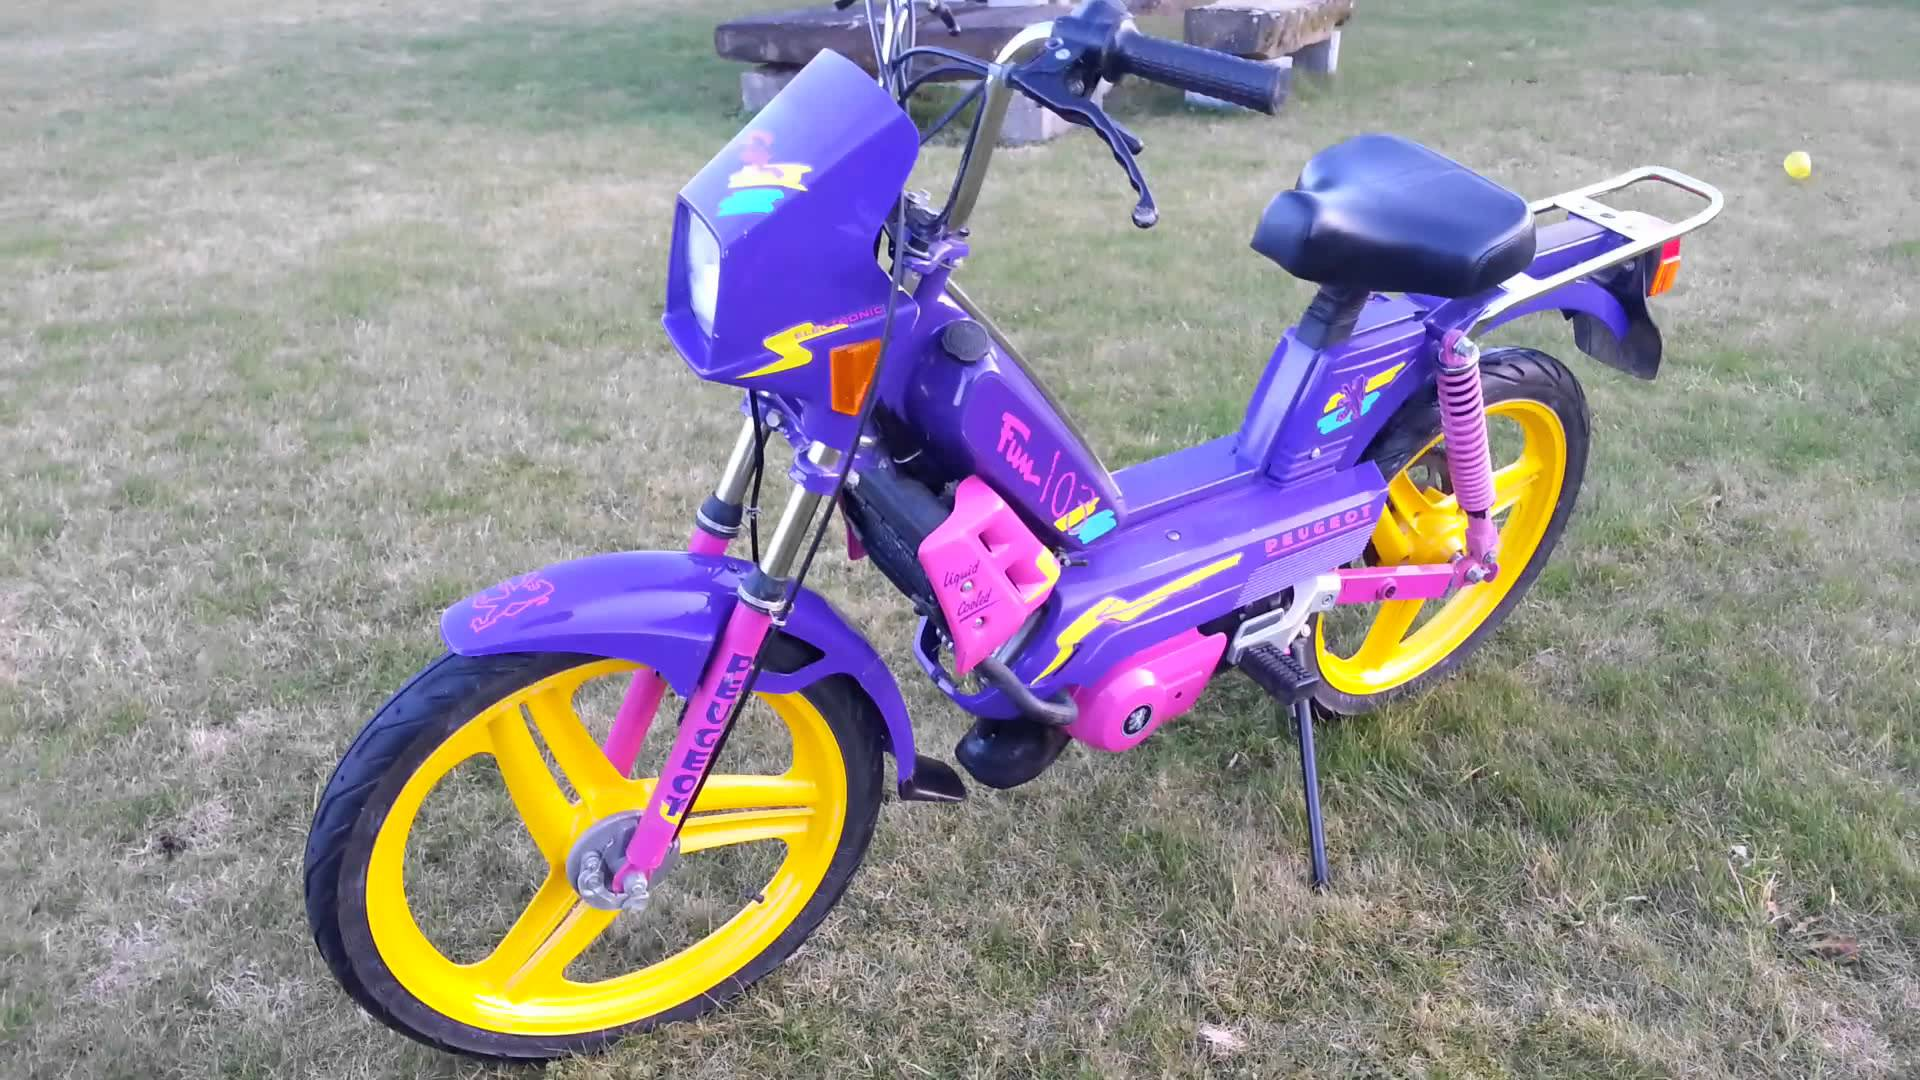 103-fun-lc-violet.jpg